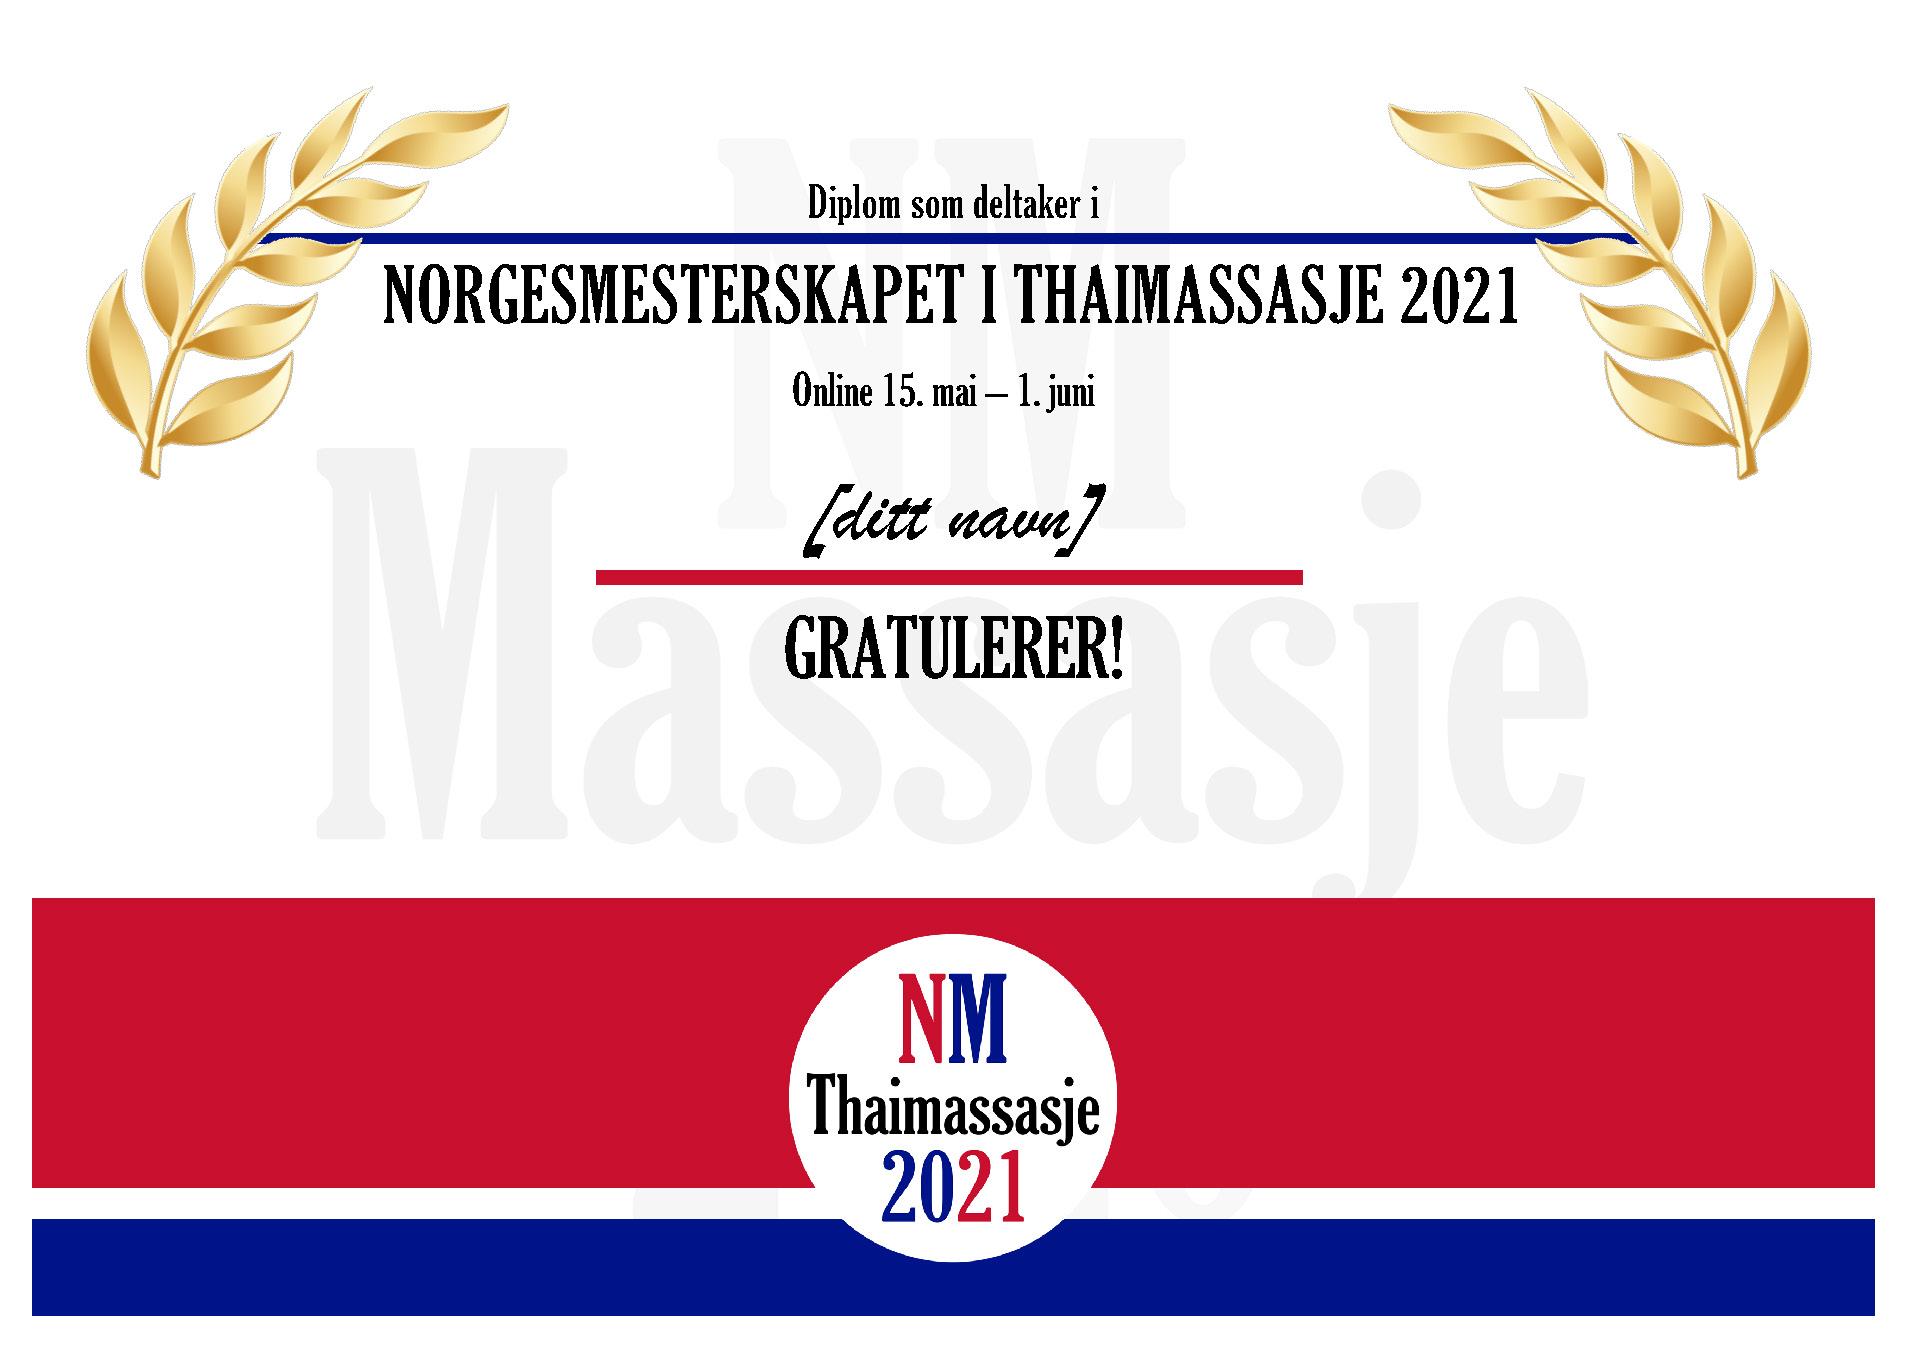 NM i Thaimassasje 2021